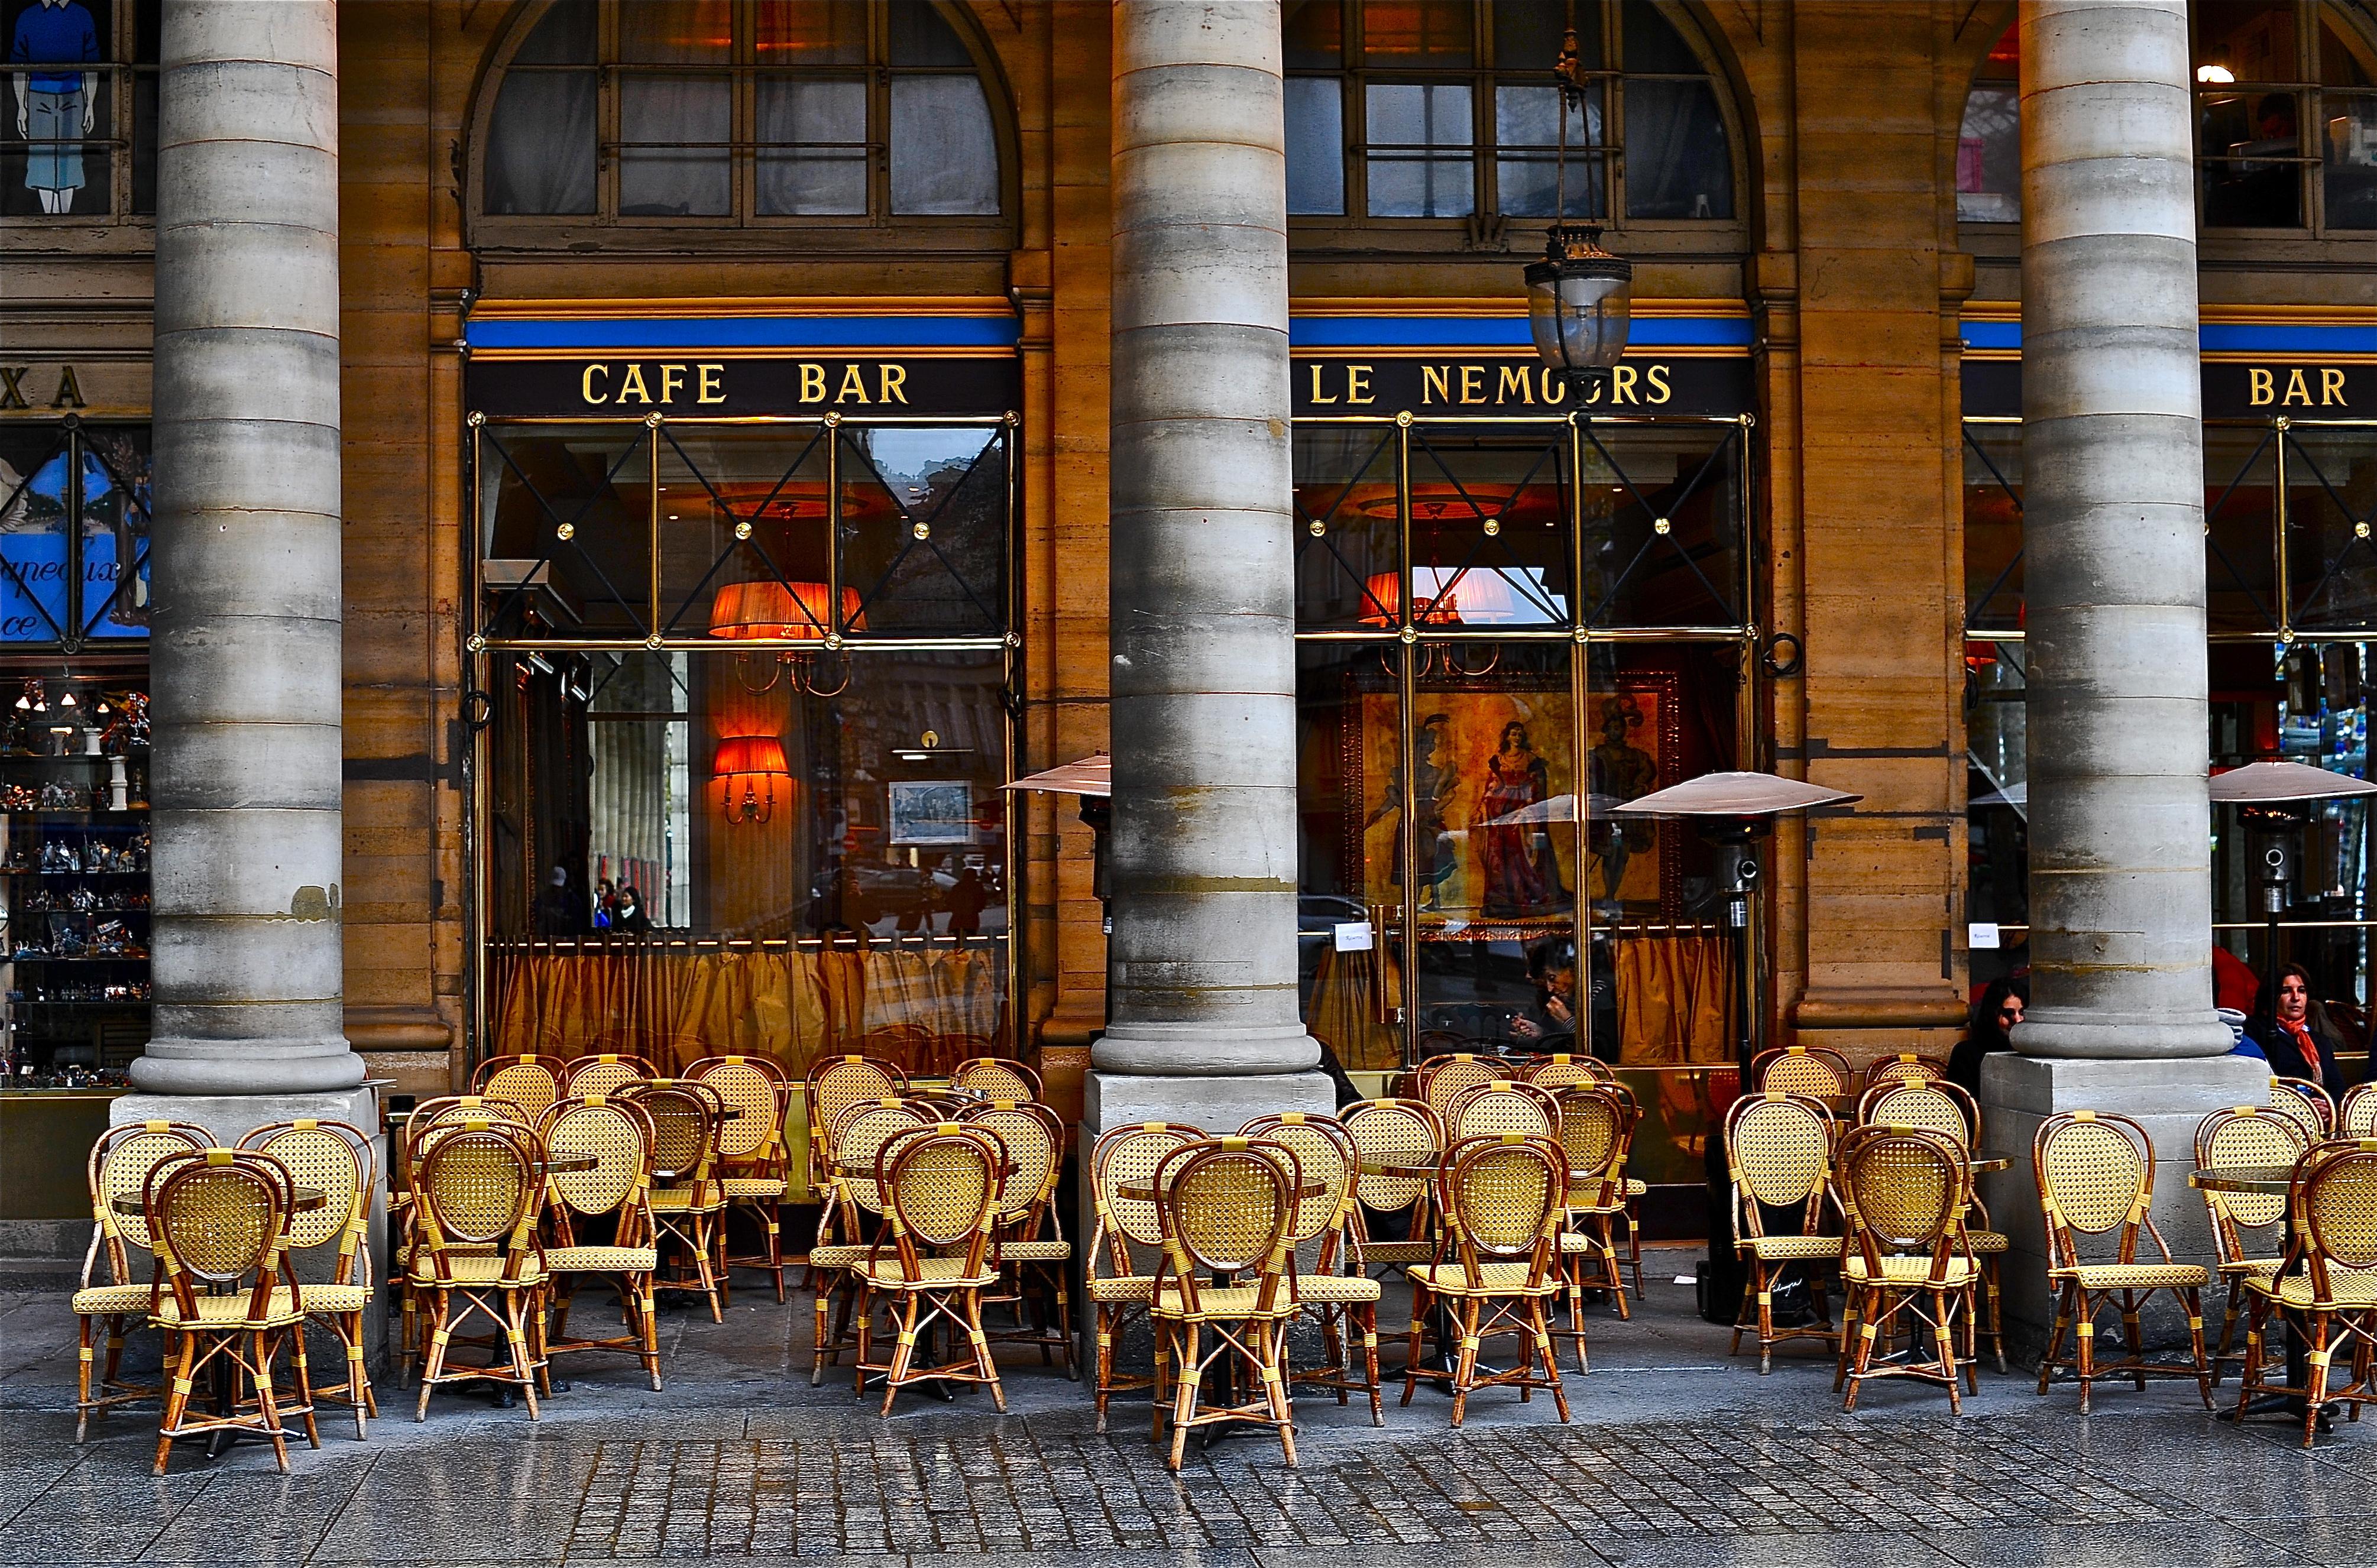 Scene Cafe Bar Nantes Musqiue